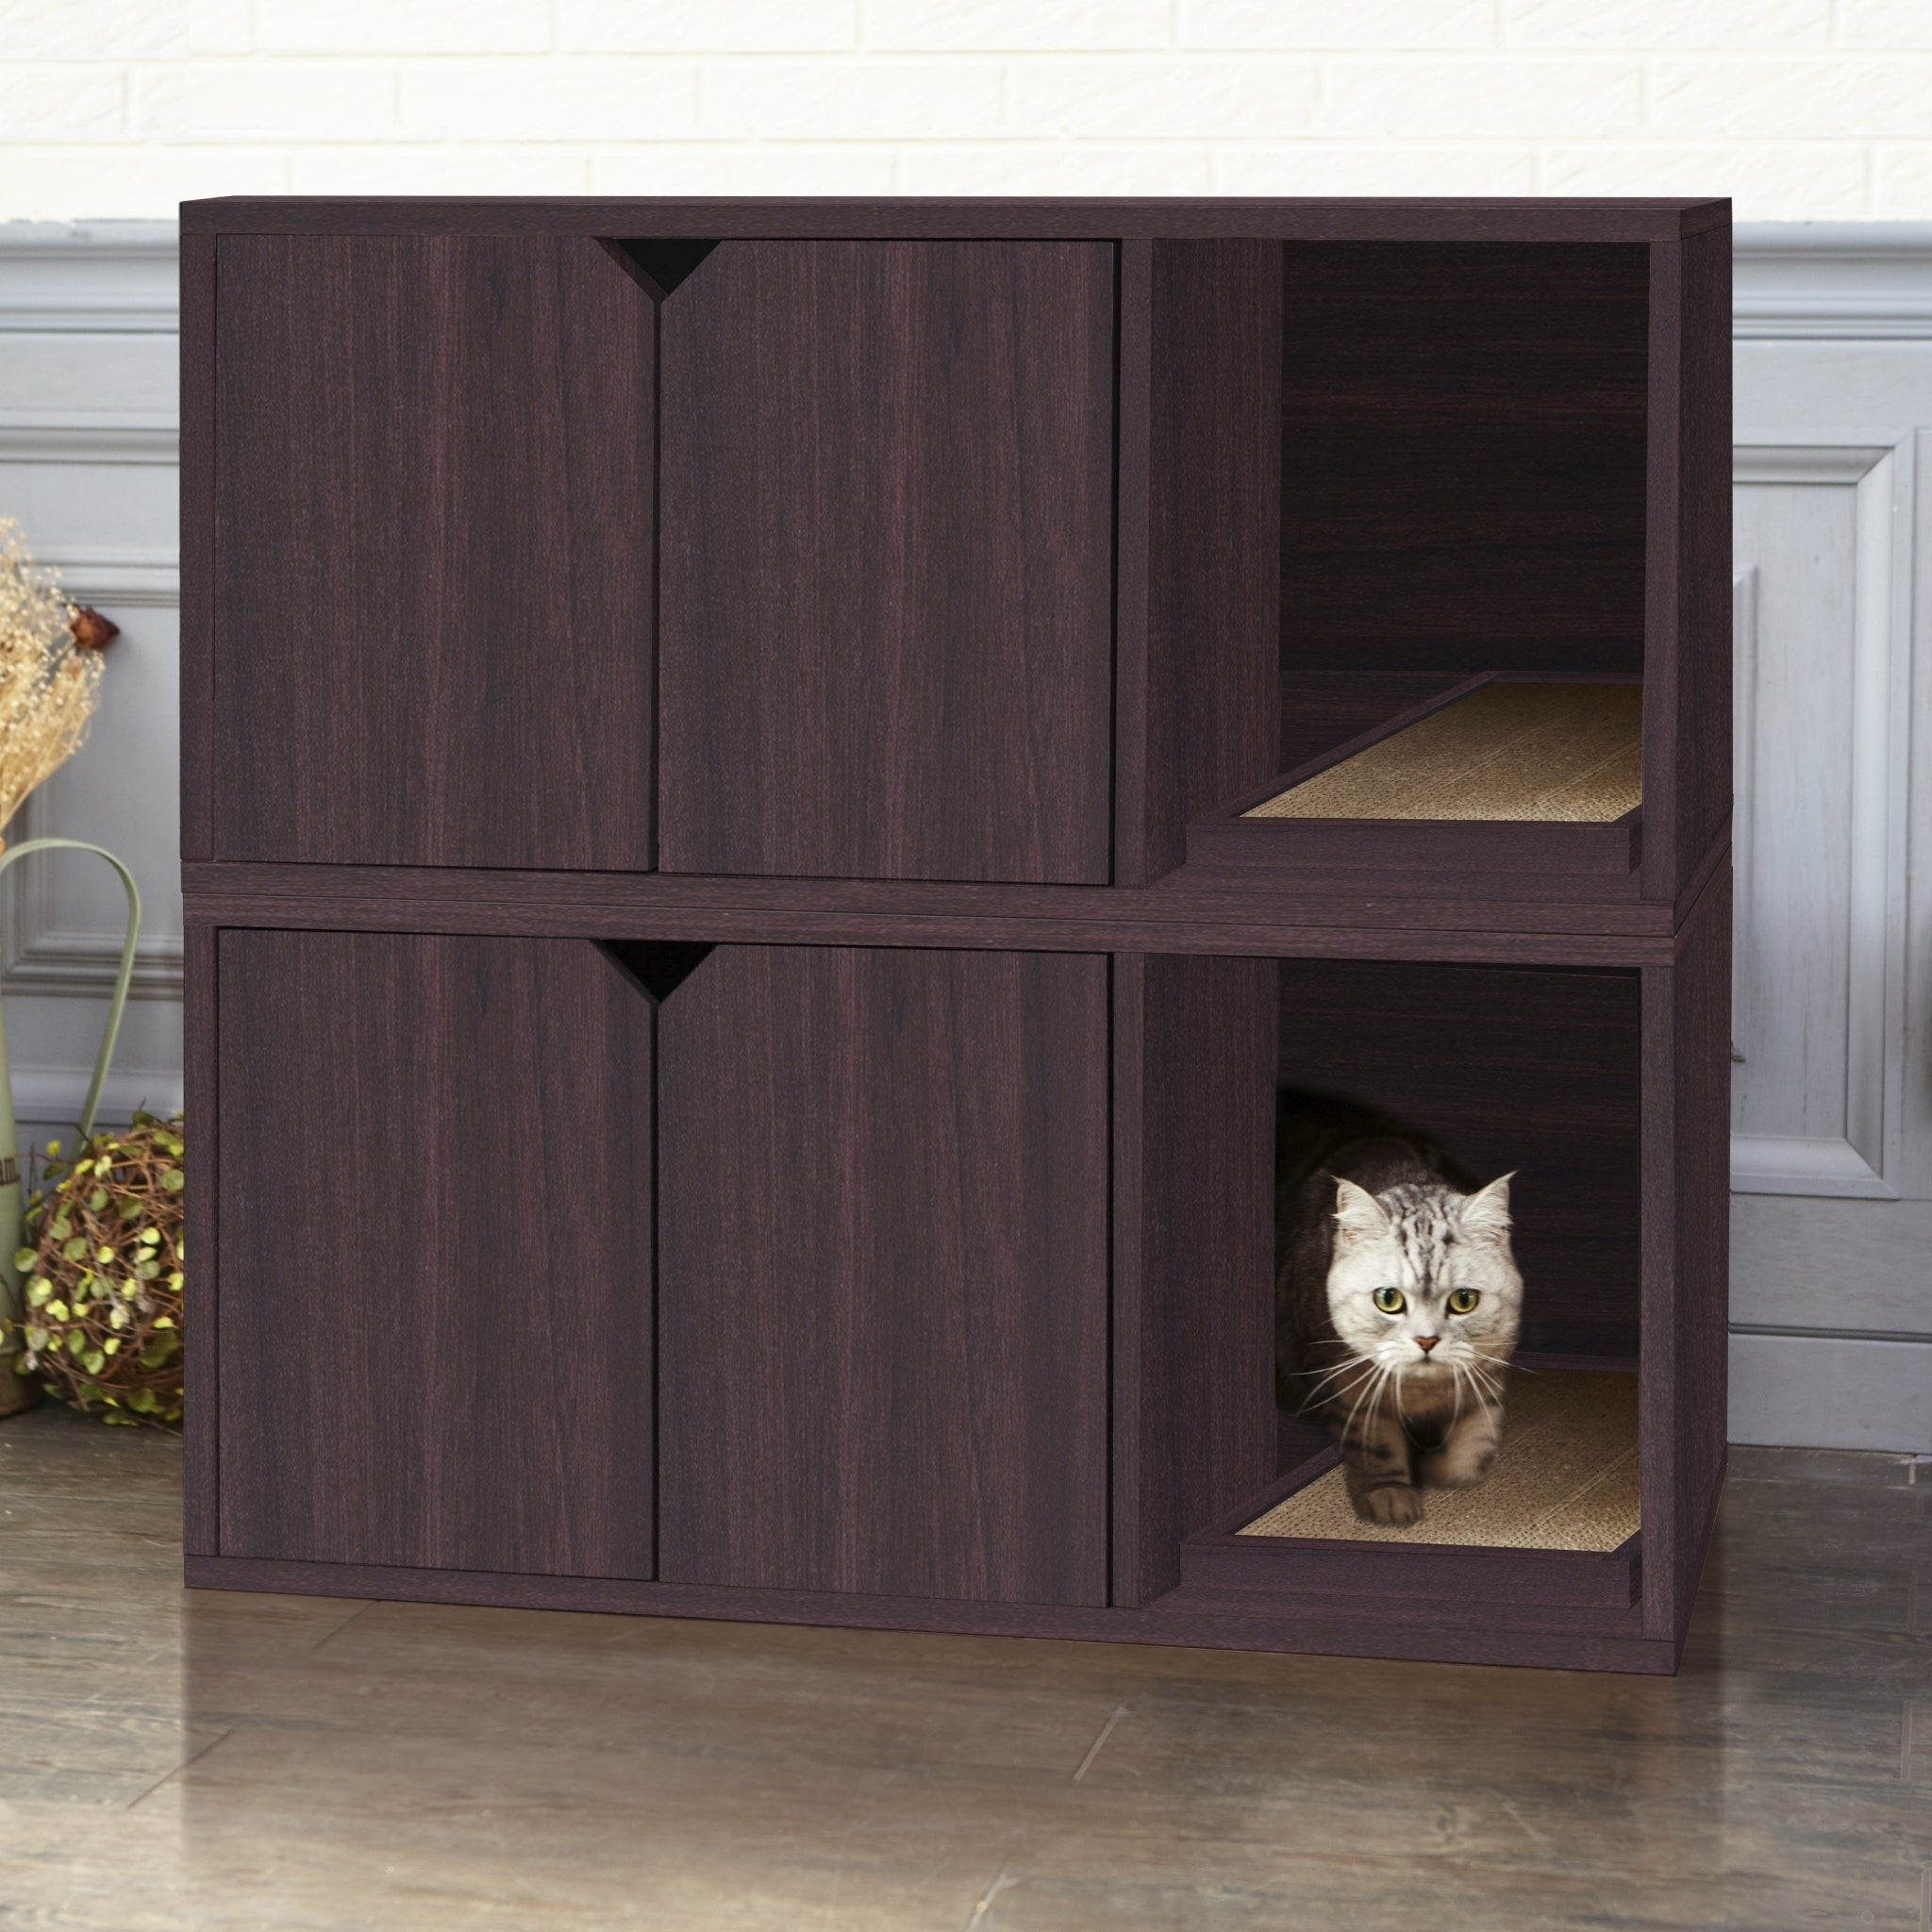 Eco Modern Double Cat Litter Box